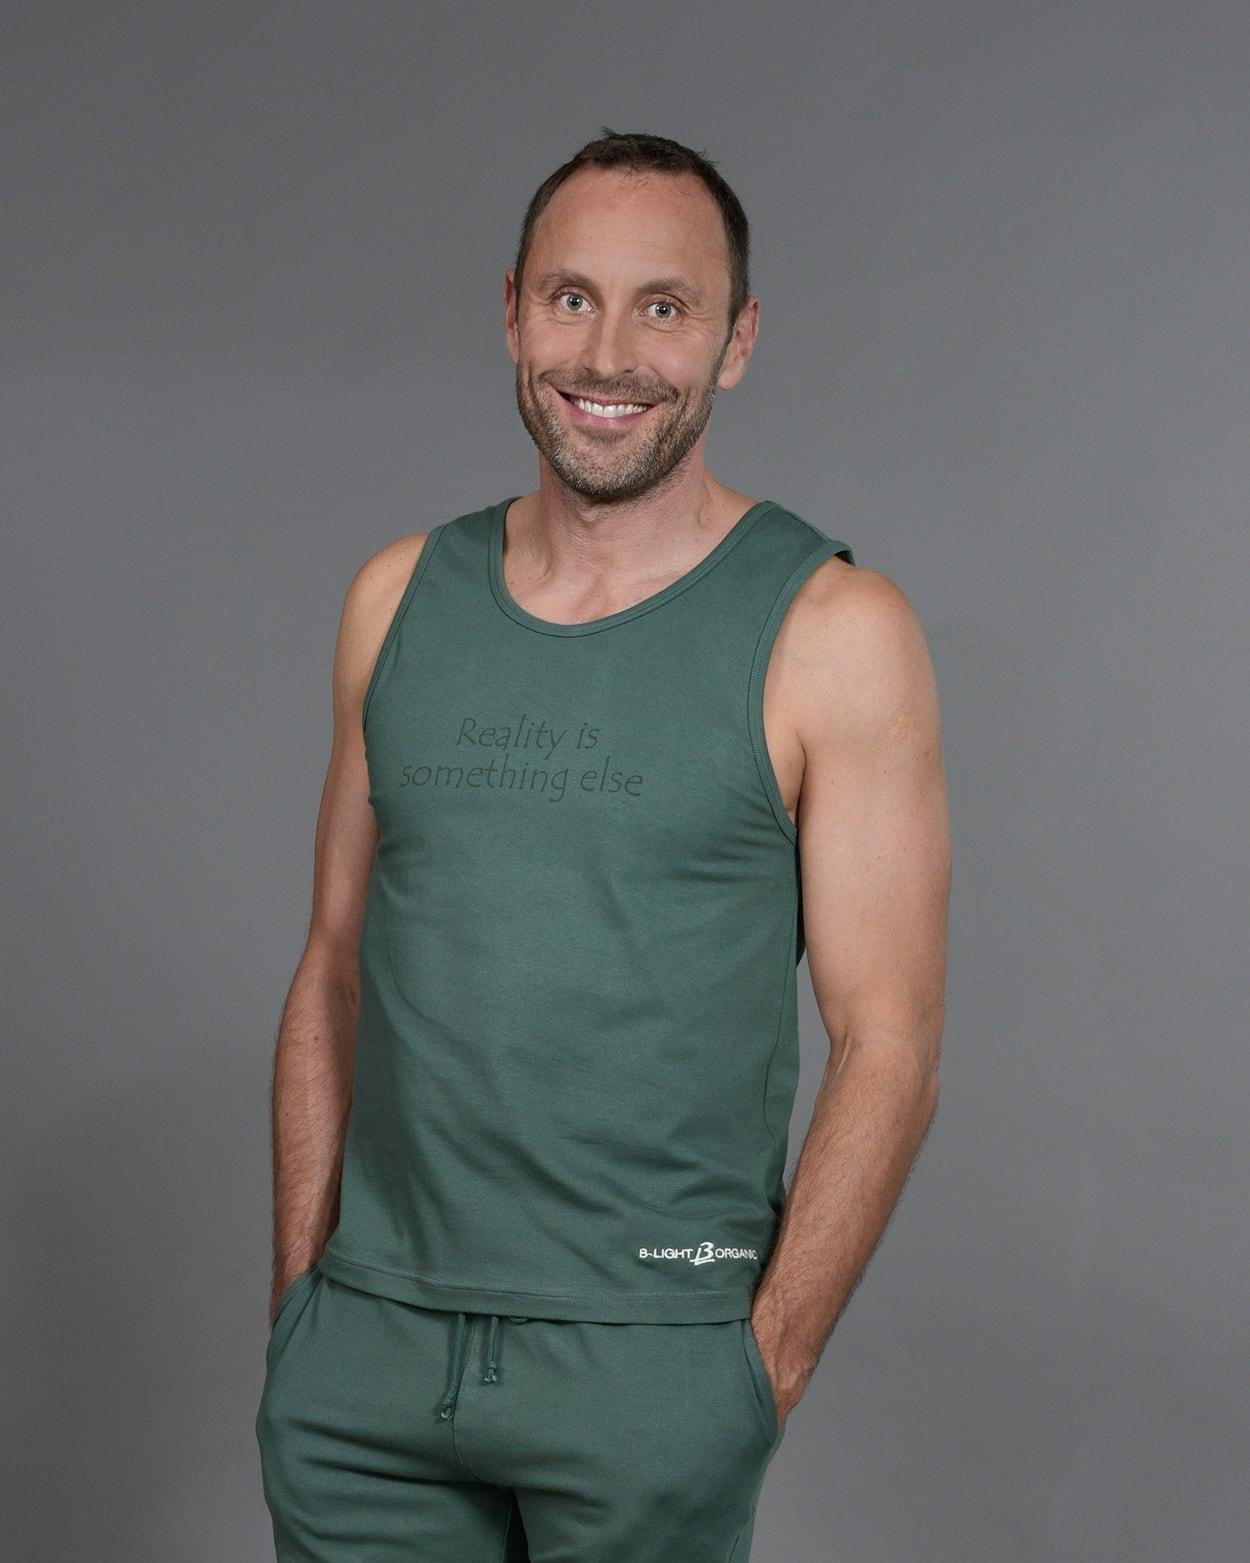 b-light-organic-clothes-tank-top-bo-green-mattias-sunneborn-2